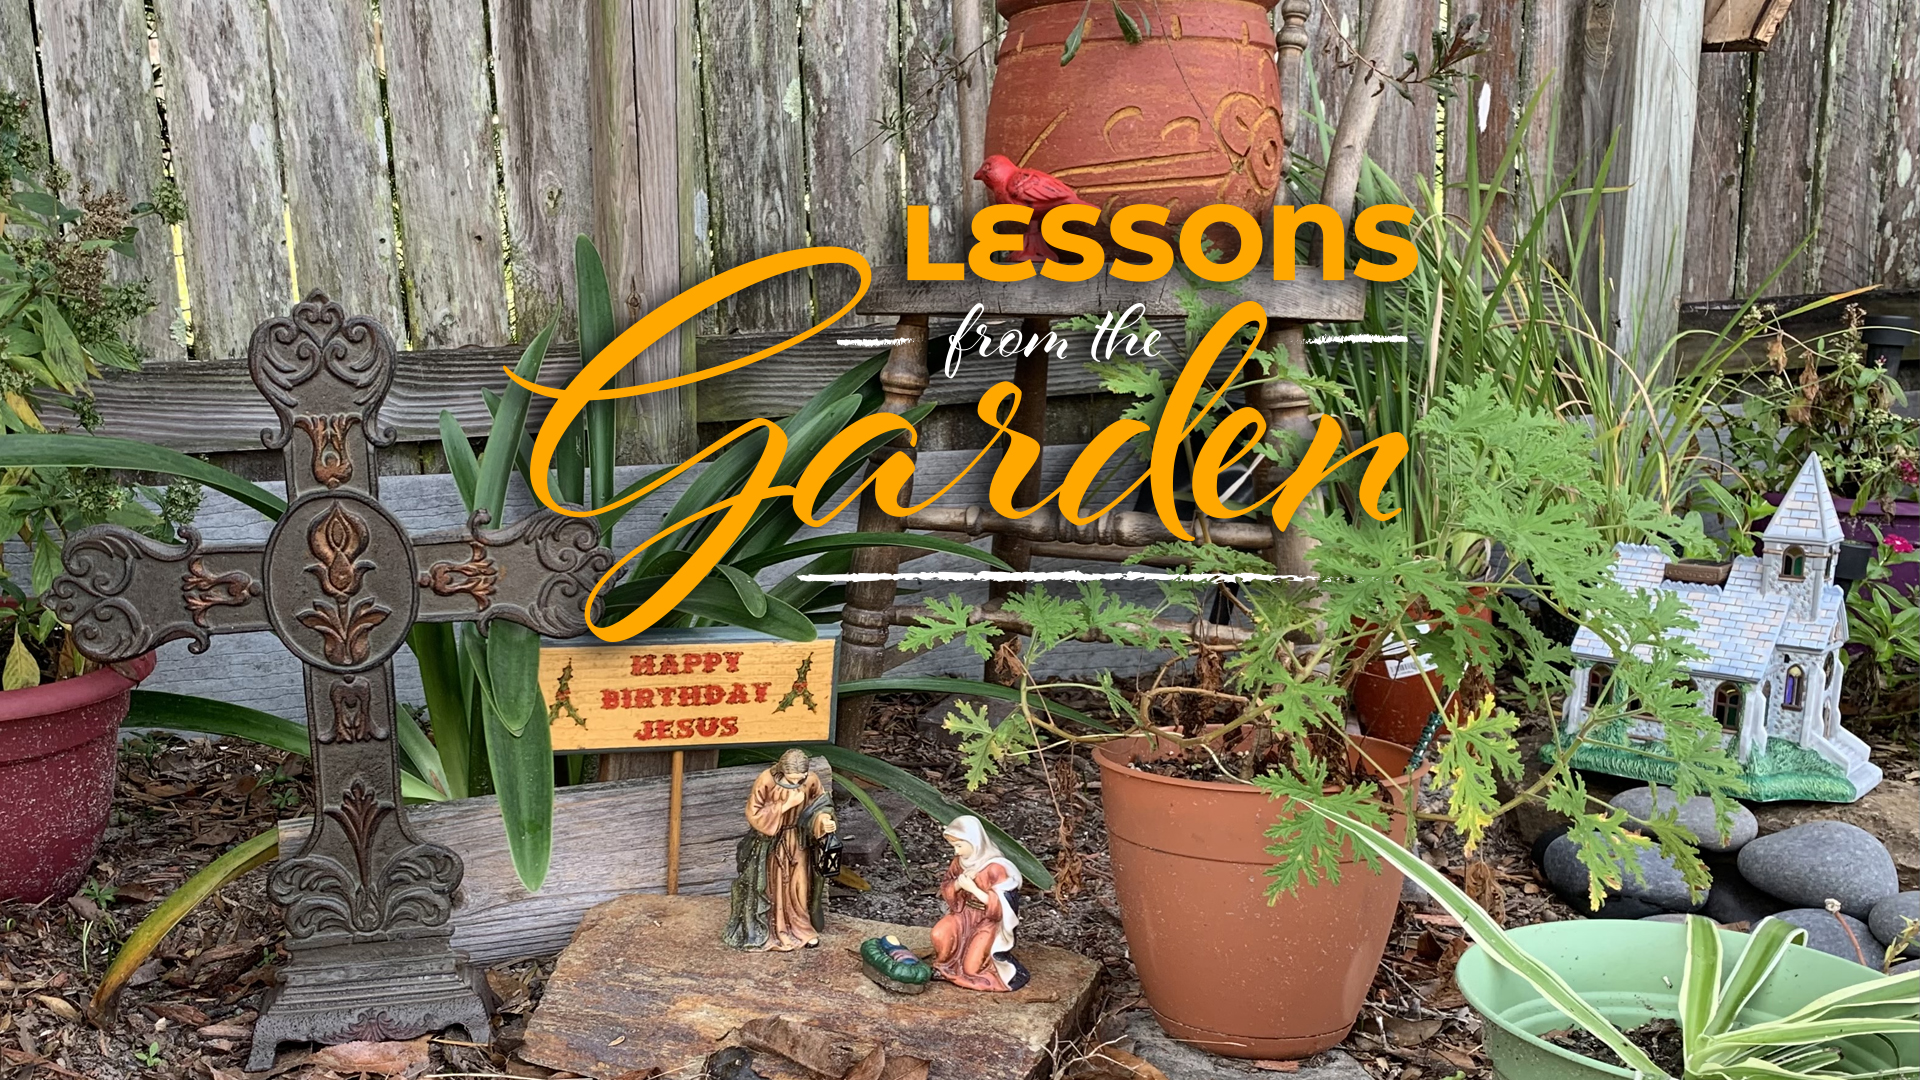 God's Will in the Garden